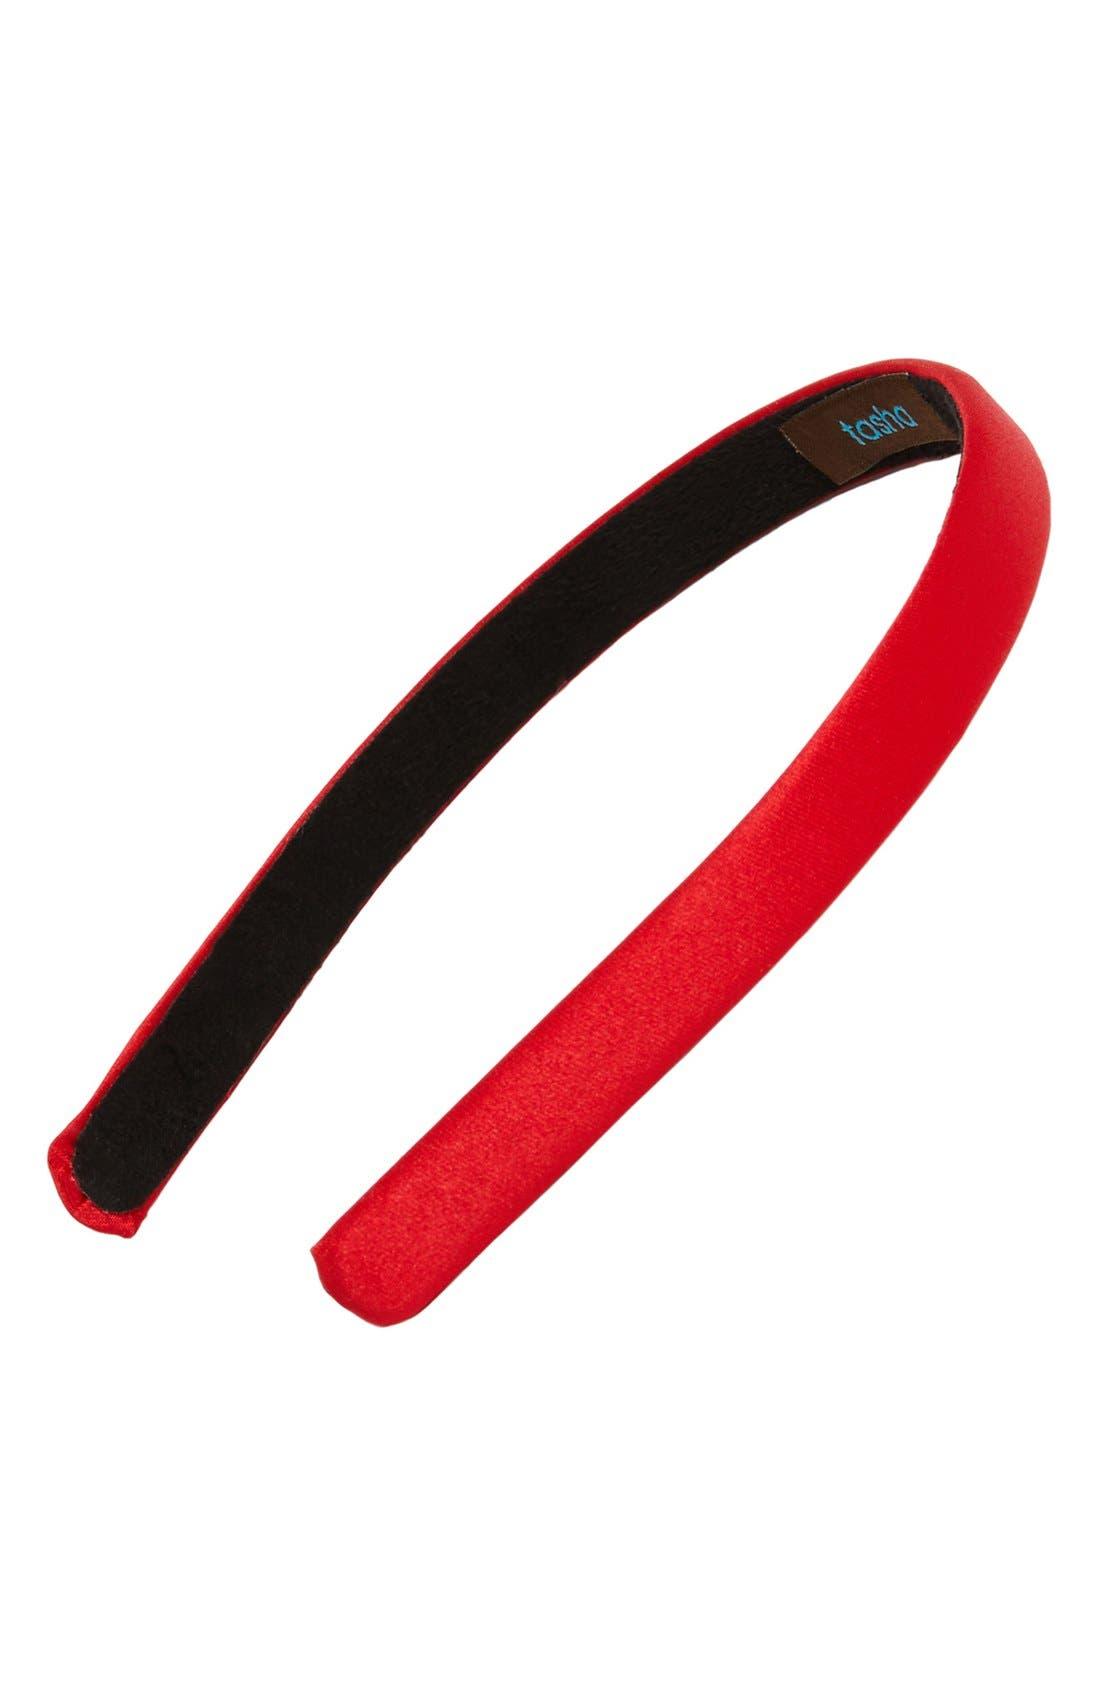 Alternate Image 1 Selected - Tasha 'Go To' Headband